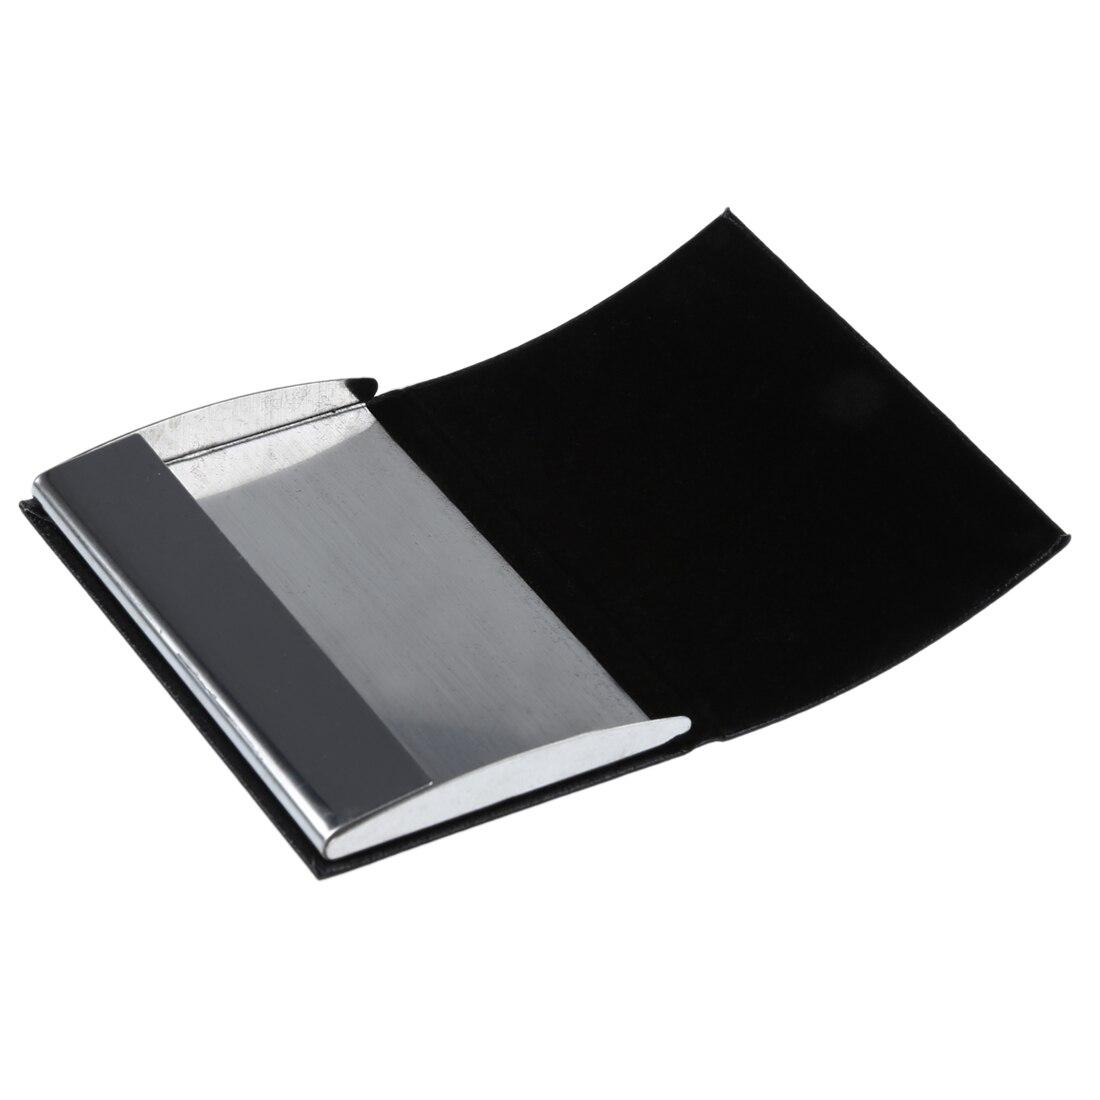 Wholesale Business Name Card Holder Case Organizer(Black)